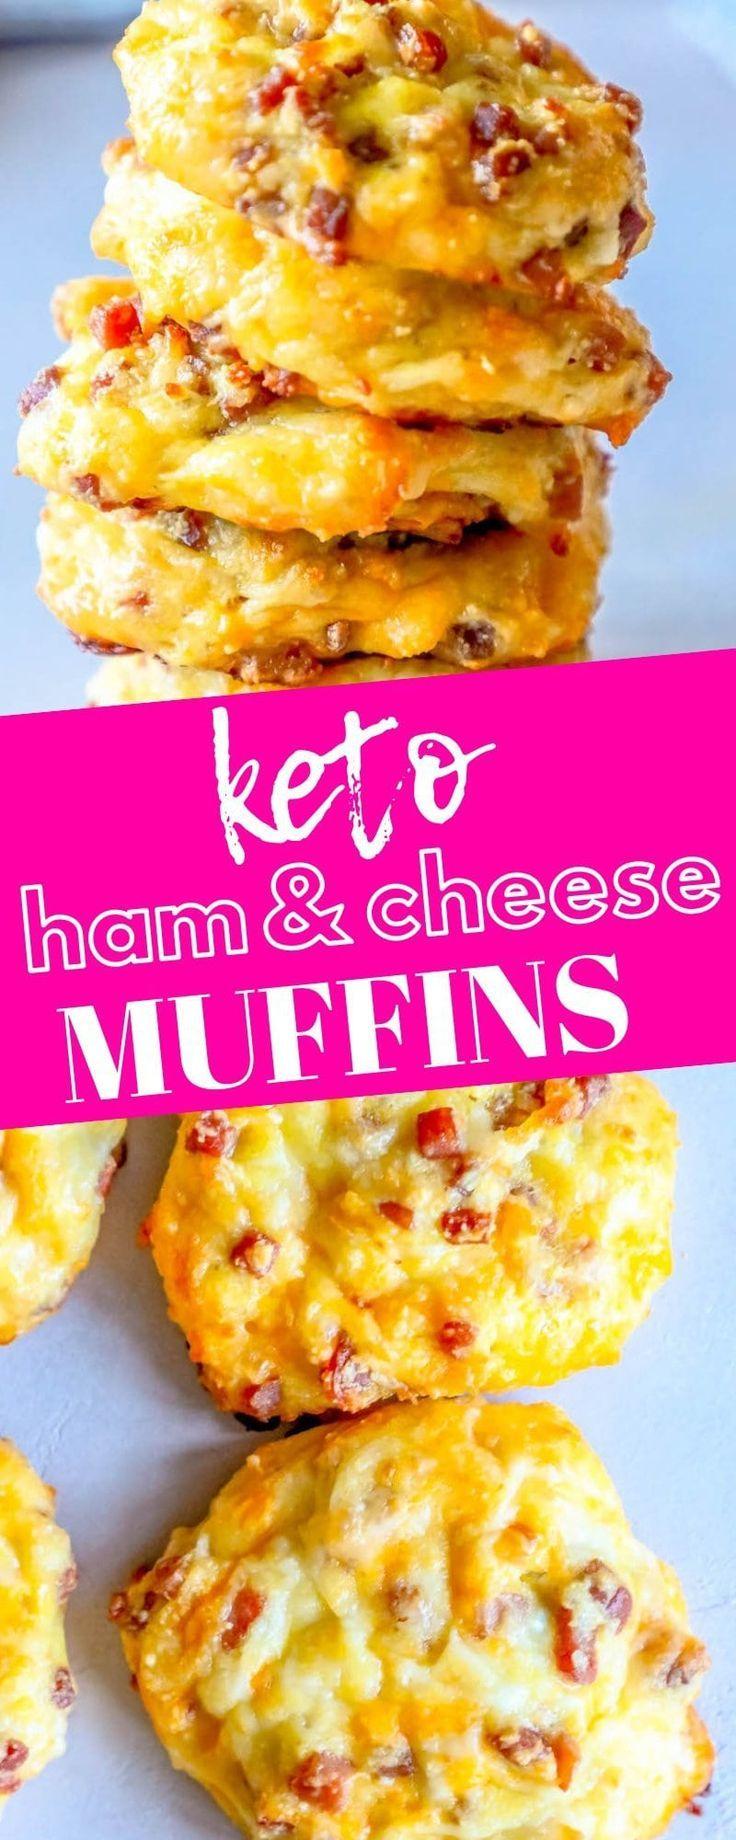 Easy Keto Ham and Cheese Rolls Recipe - Sweet Cs Designs Easy Keto Ham and Cheese Rolls Recipe - Sweet Cs Designs